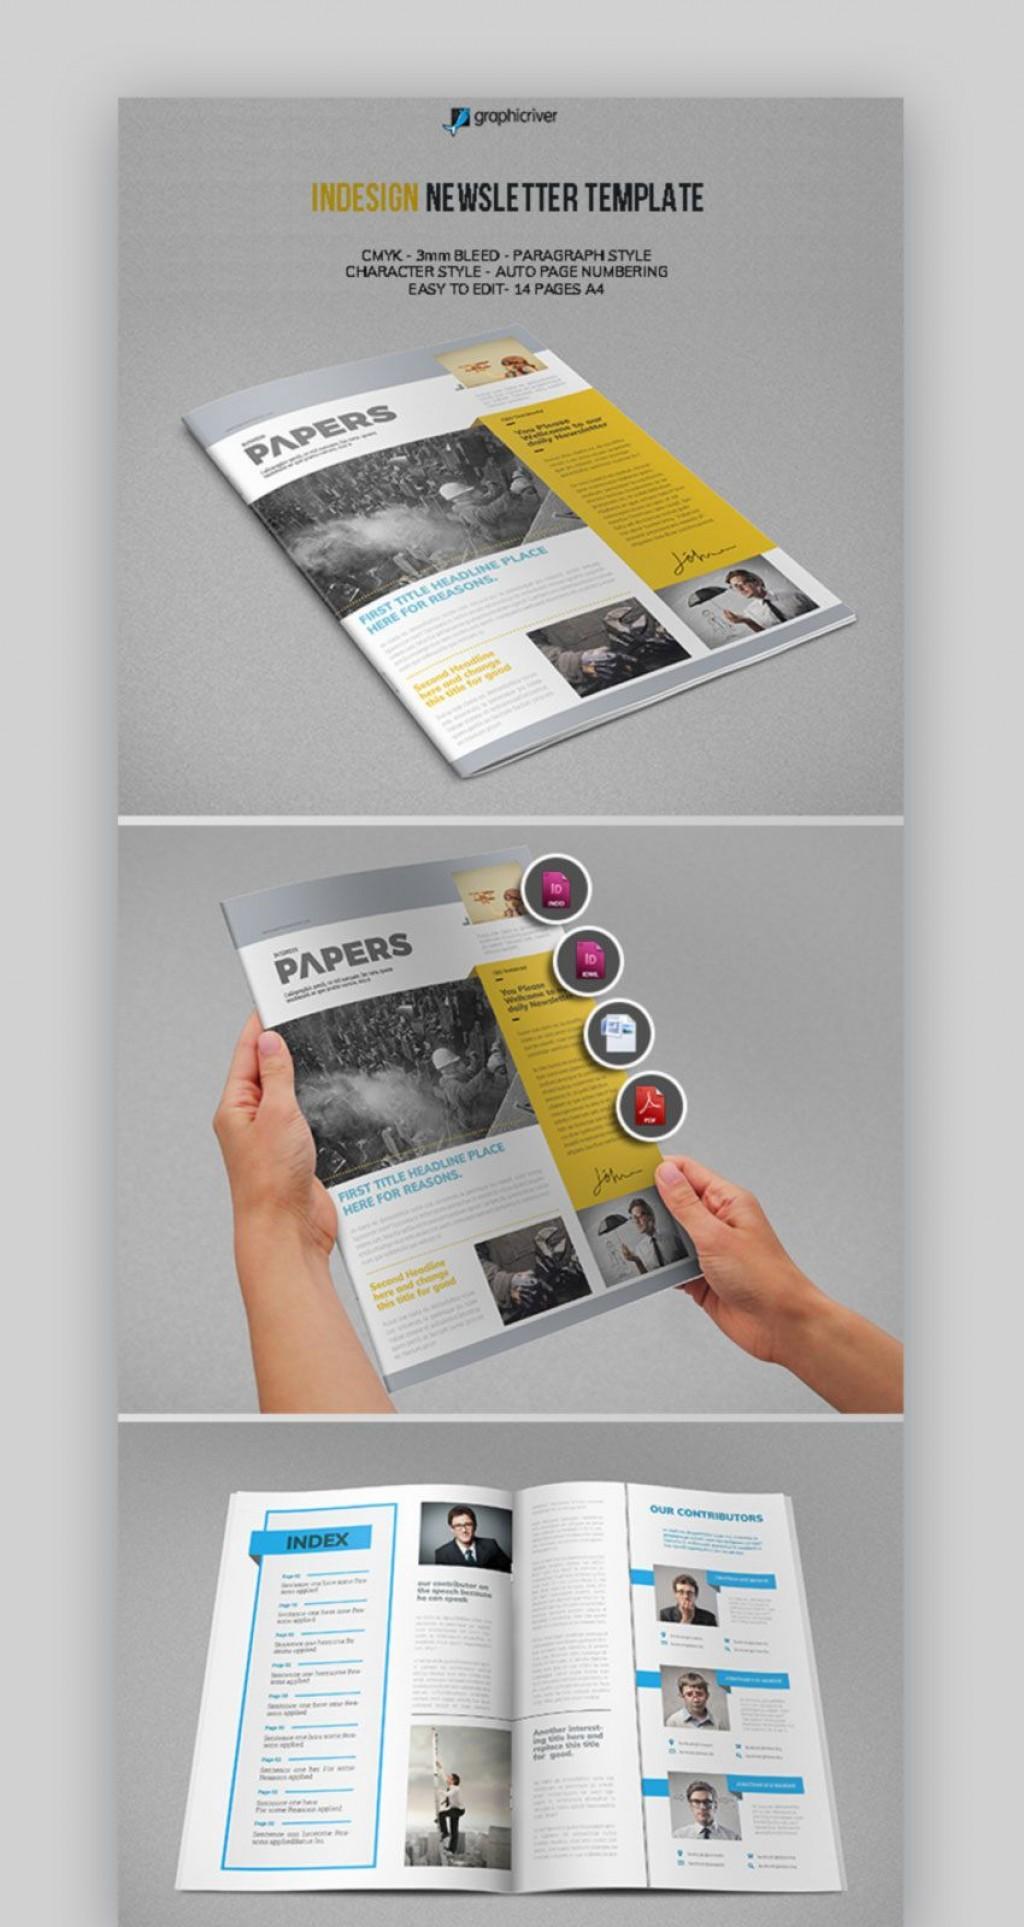 004 Phenomenal Publisher Newsletter Template Free Image  Microsoft Office DownloadLarge